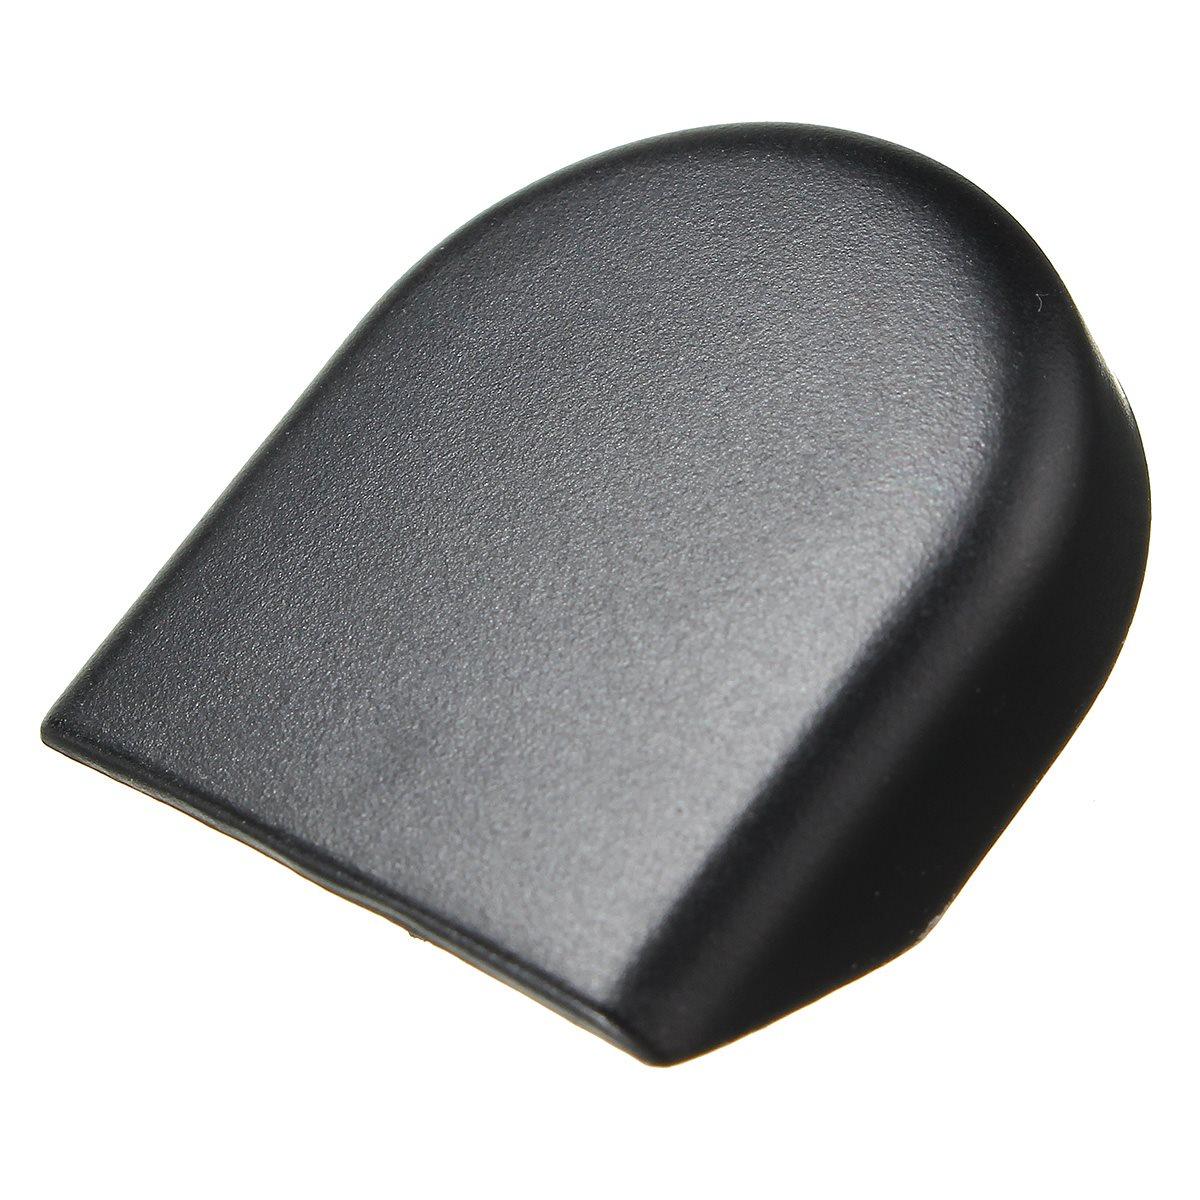 1x Car Wiper Arm Cover Screw Cap Fit For Toyota Yaris Corolla Verso Auris 85292-0f010